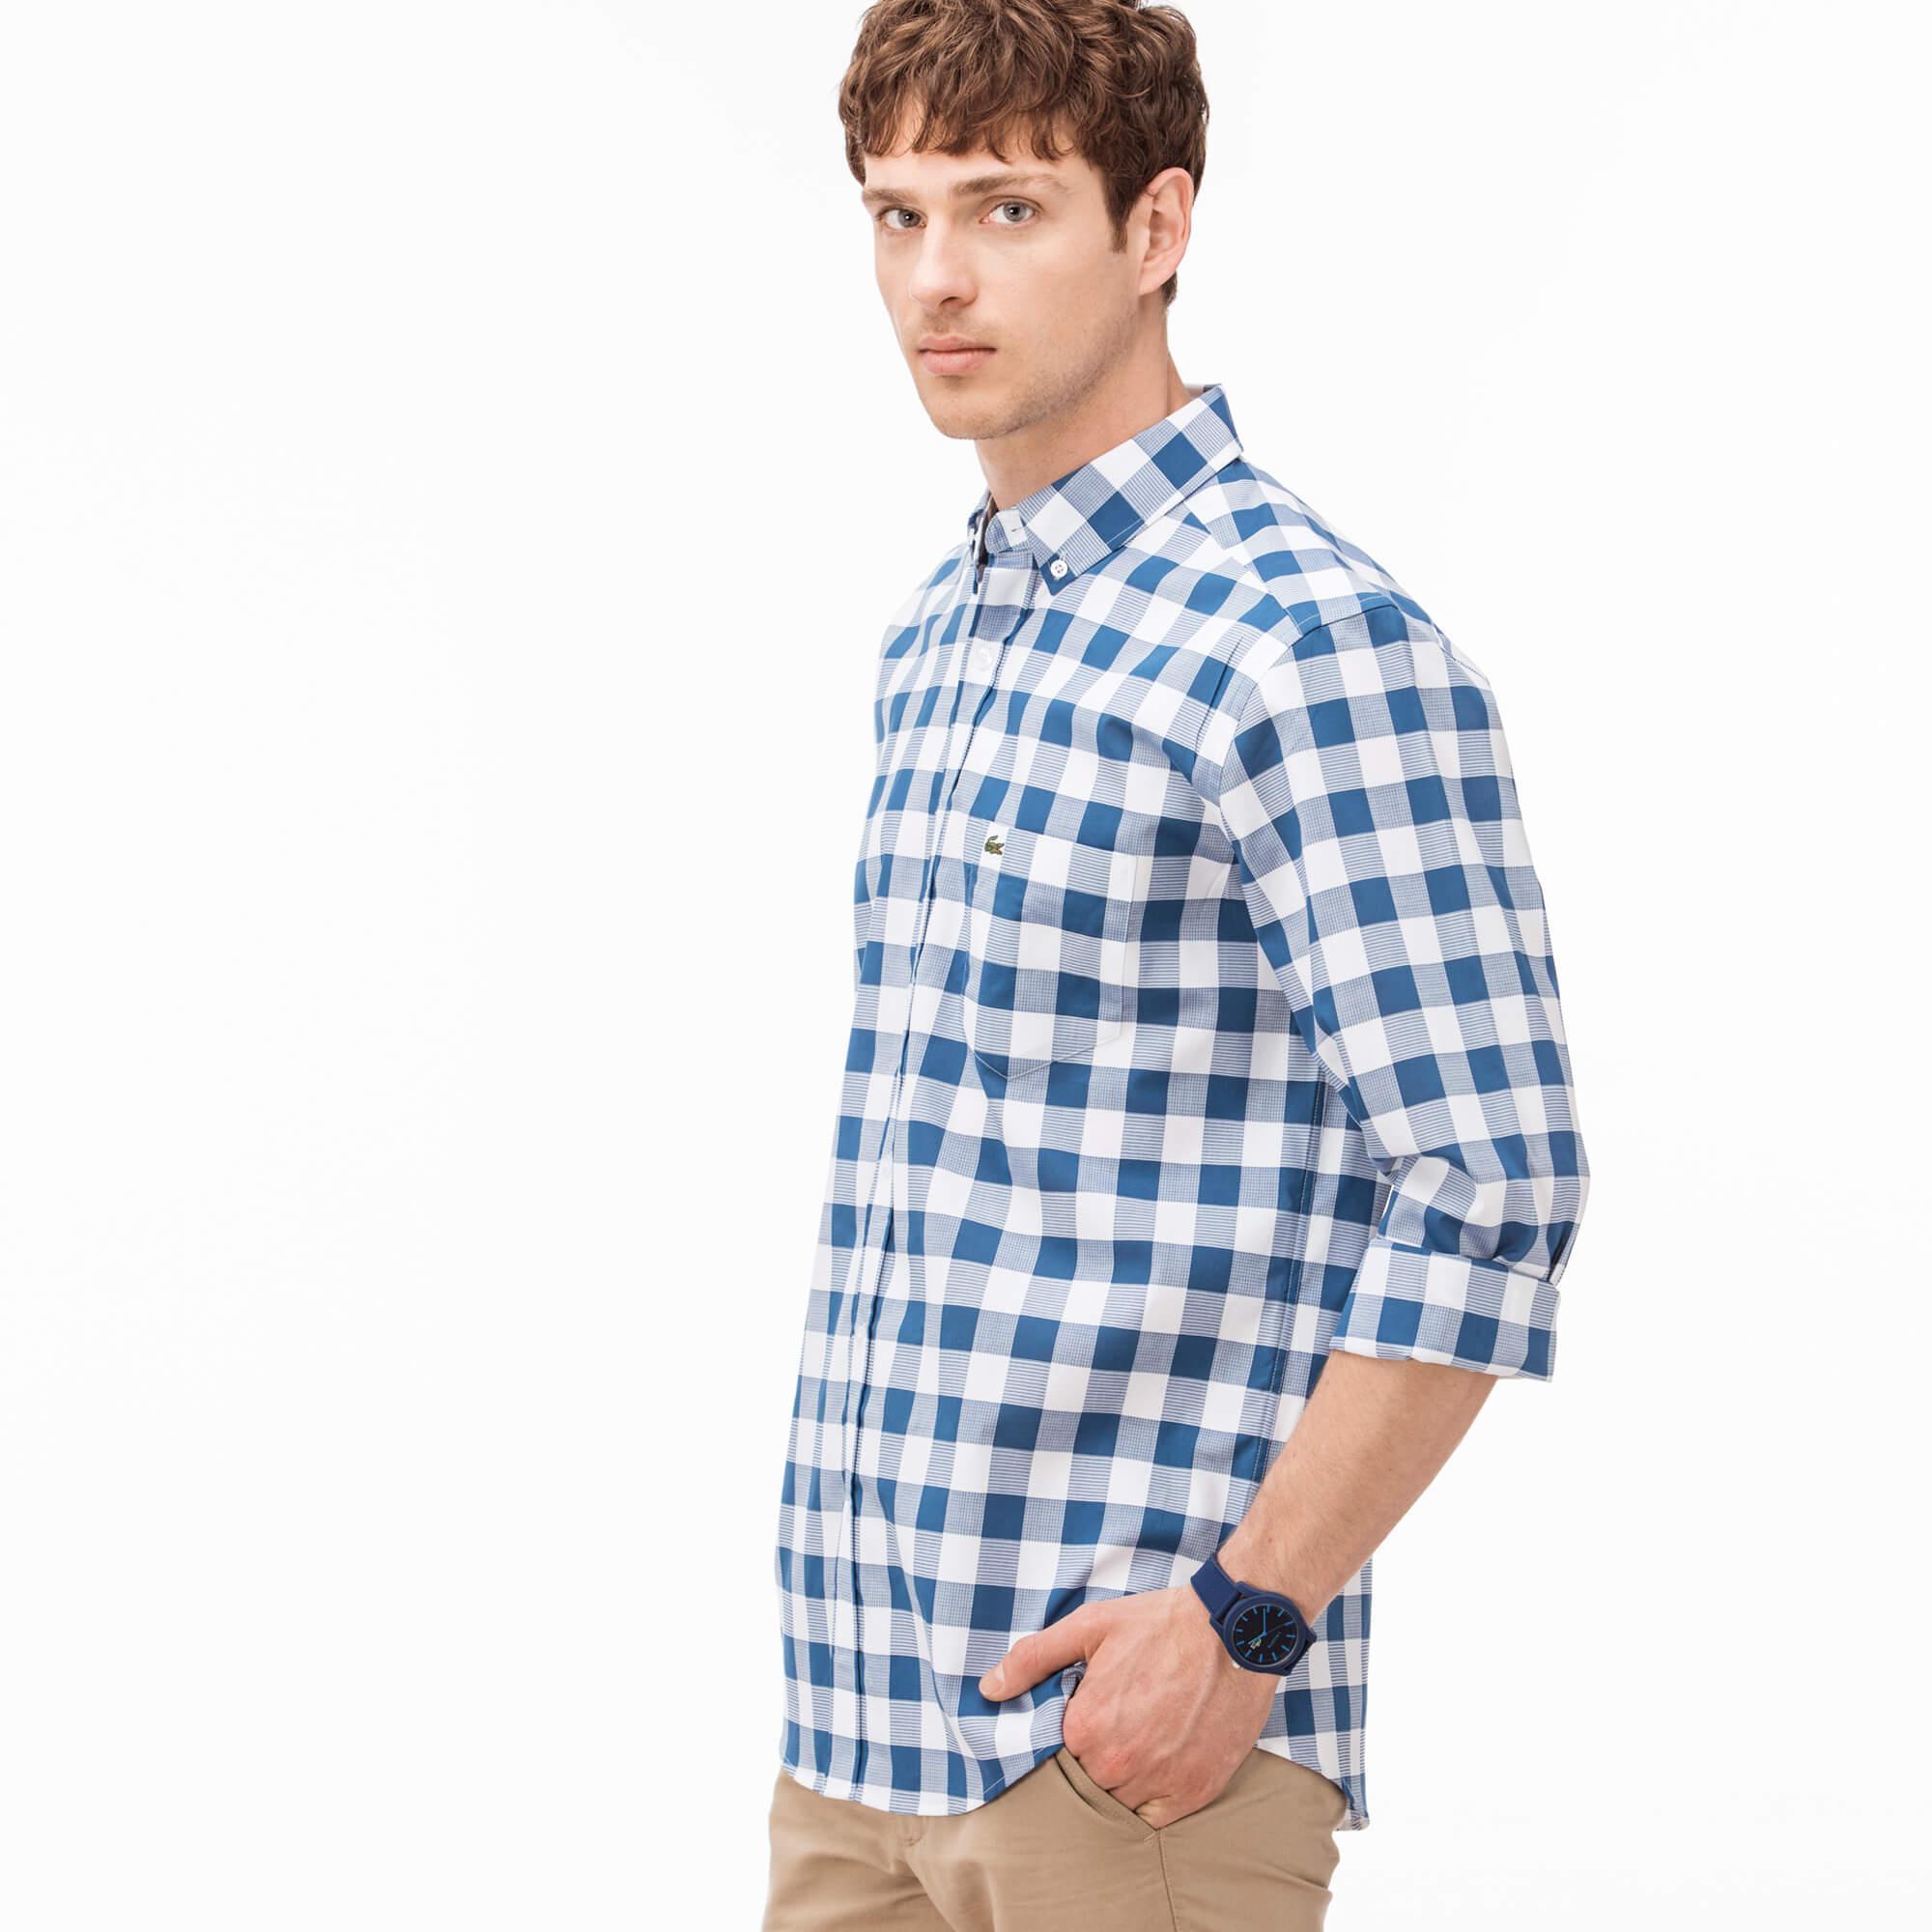 Lacoste Erkek Regular Fit Lacivert Kareli Gömlek